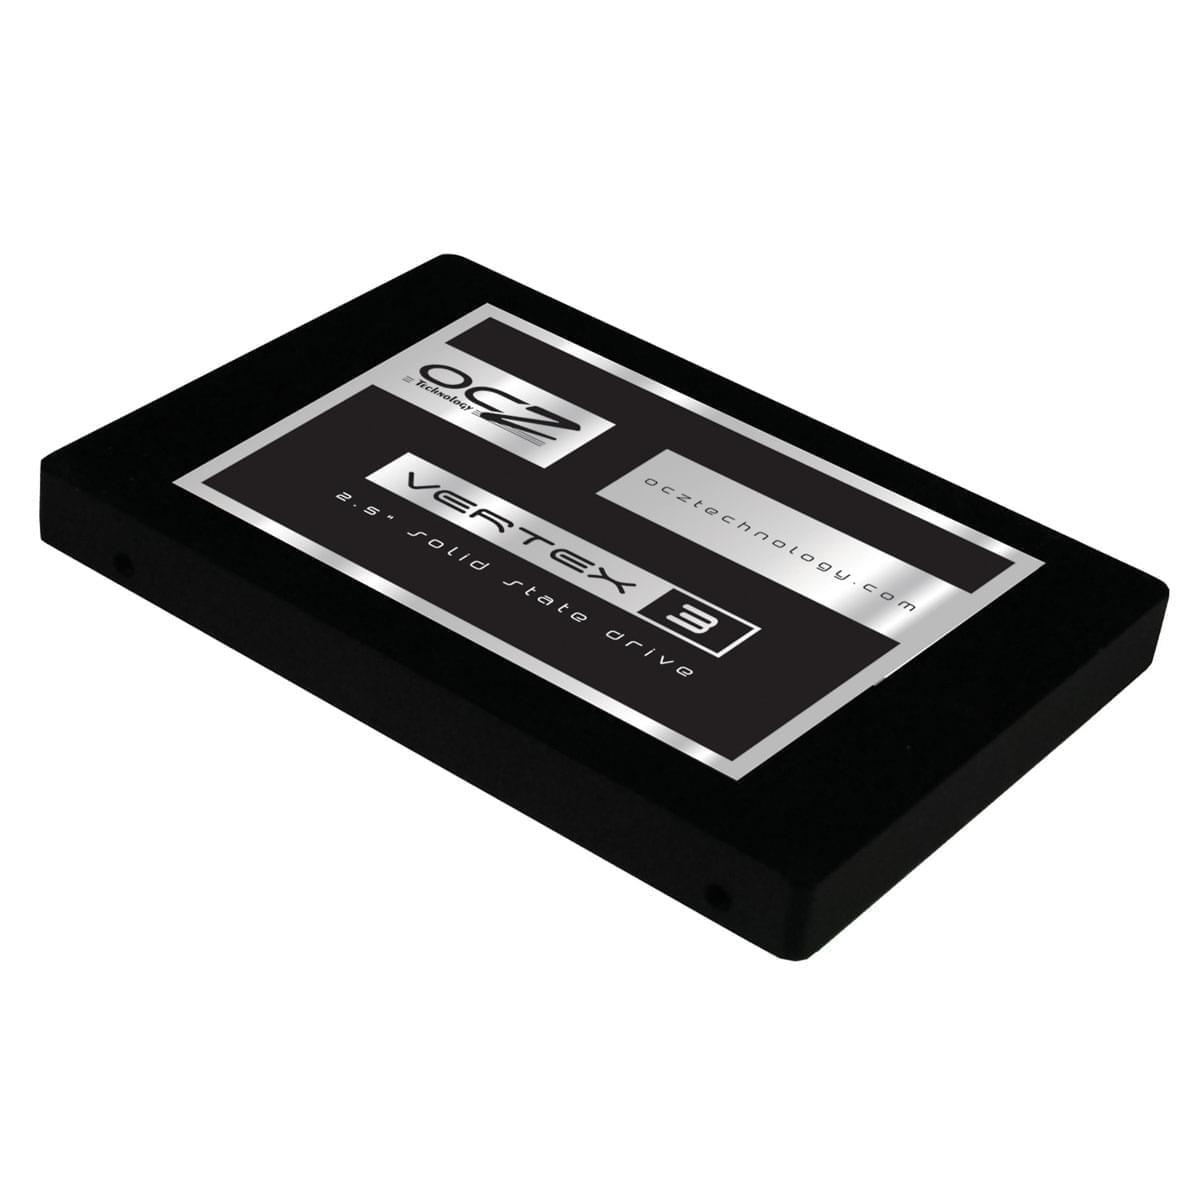 OCZ 120Go SSD Vertex 3 VTX3-25SAT3-120G SATA 6 (VTX3-25SAT3-120G) - Achat / Vente Disque SSD sur Cybertek.fr - 0